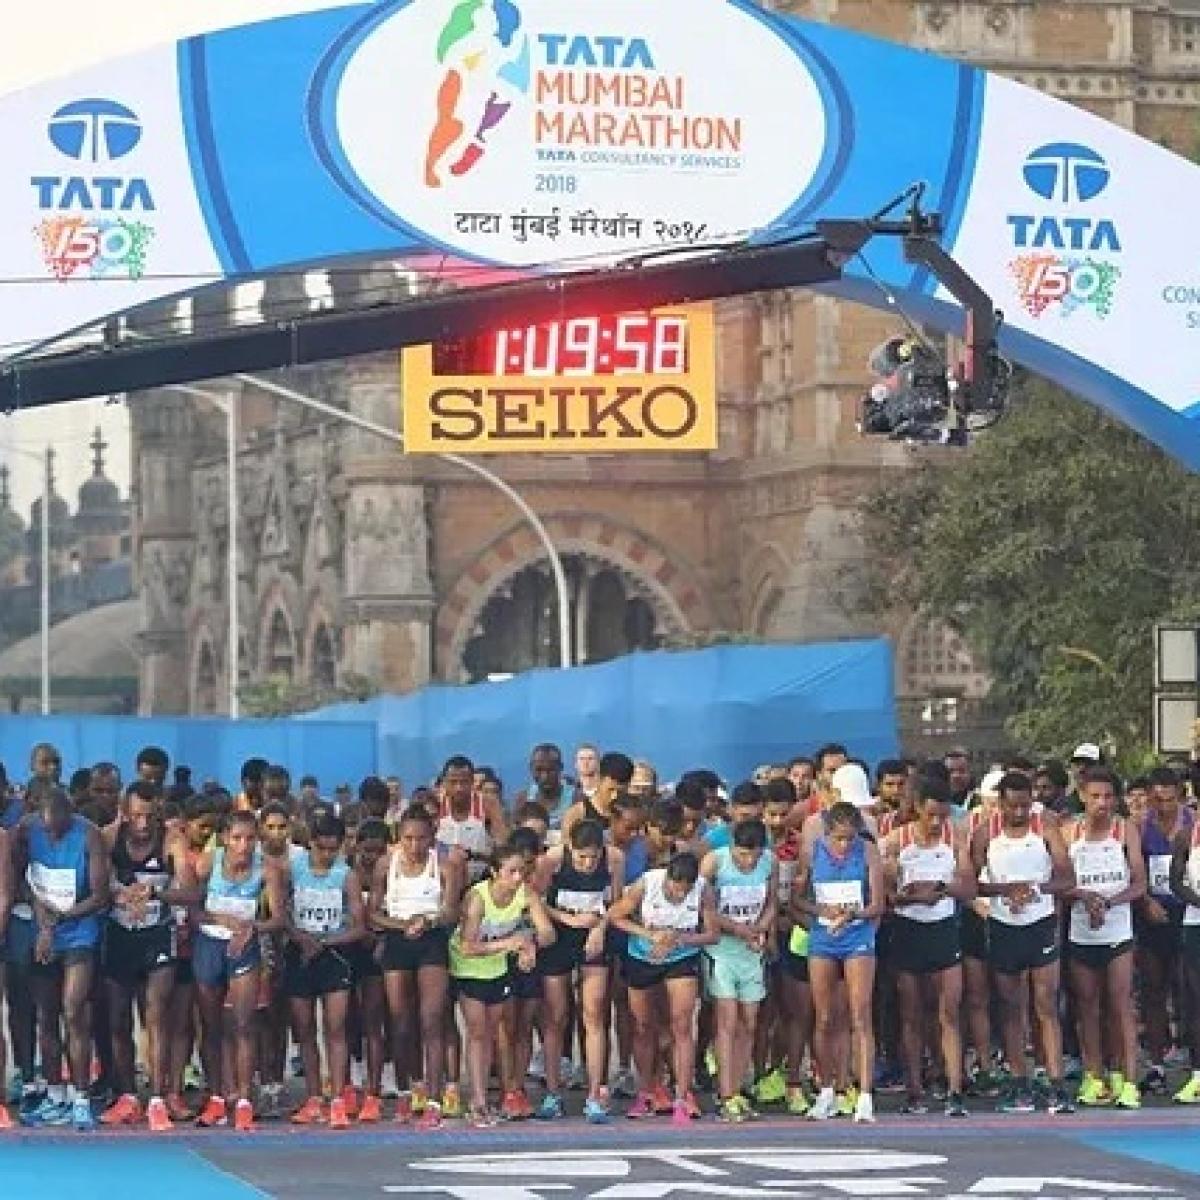 Mumbai Marathon 2020: Police issue traffic advisory for roads to avoid